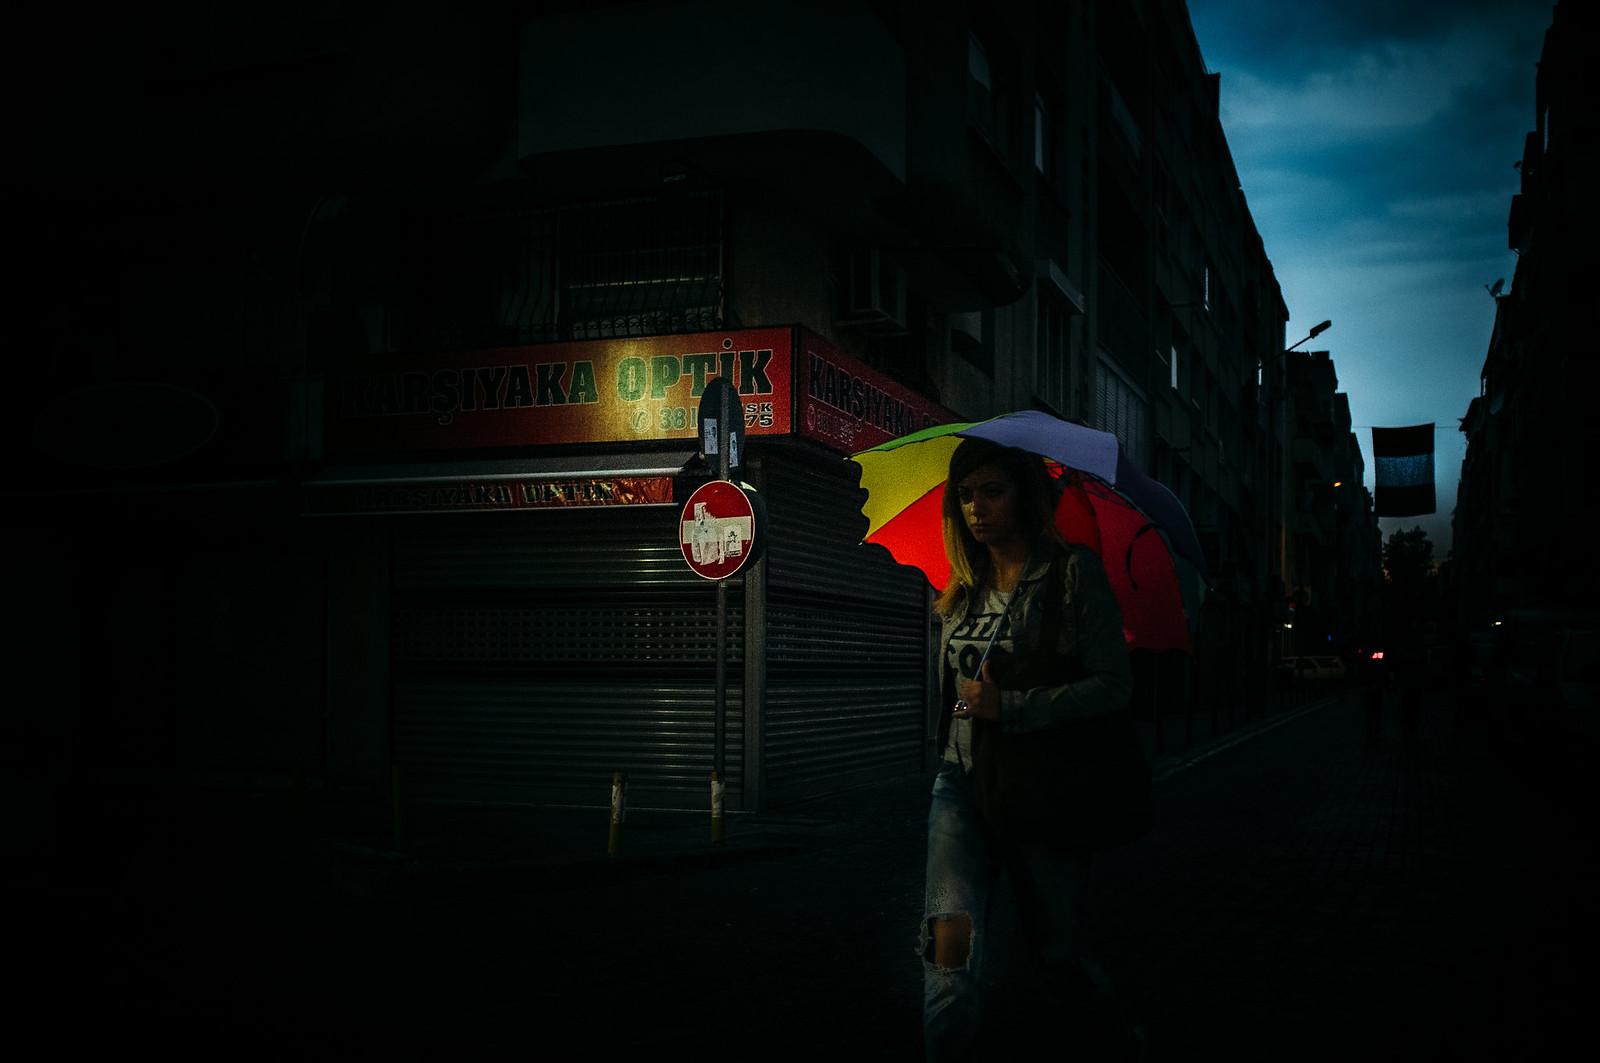 izmr noire | by anilaydn